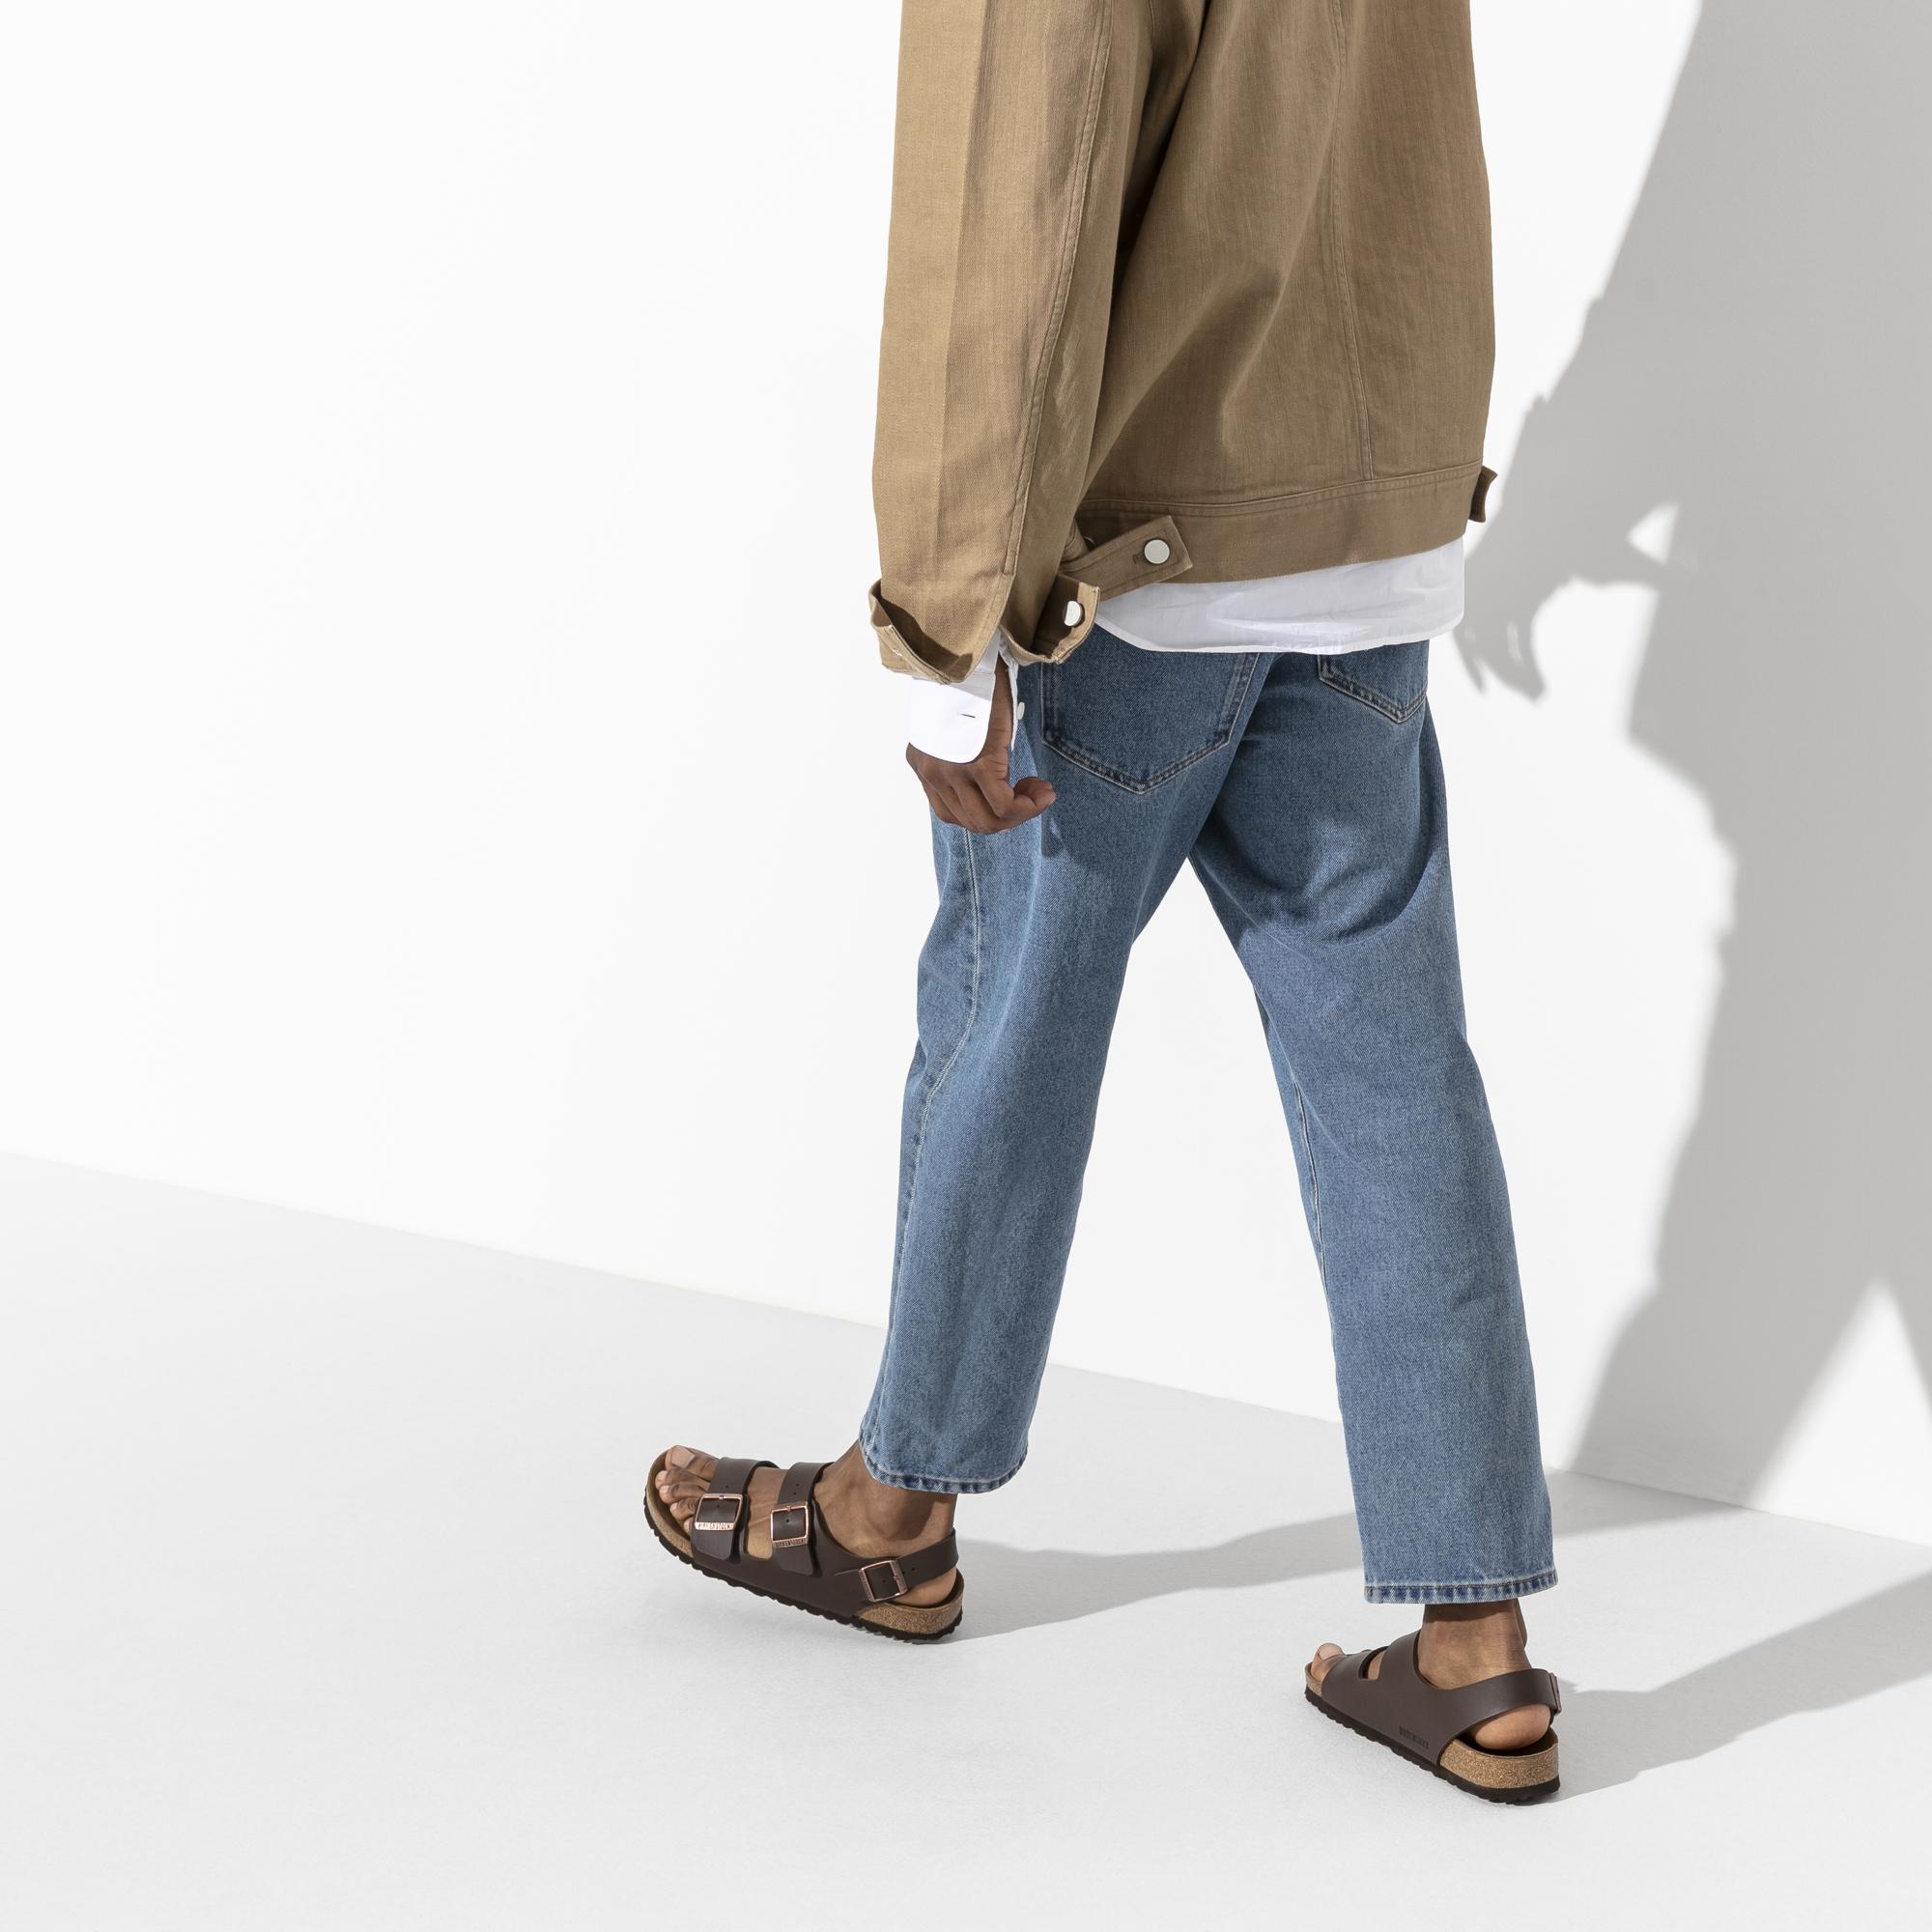 Details about Birkenstock Milano White Mens Birko Flor Three Straps Sandals